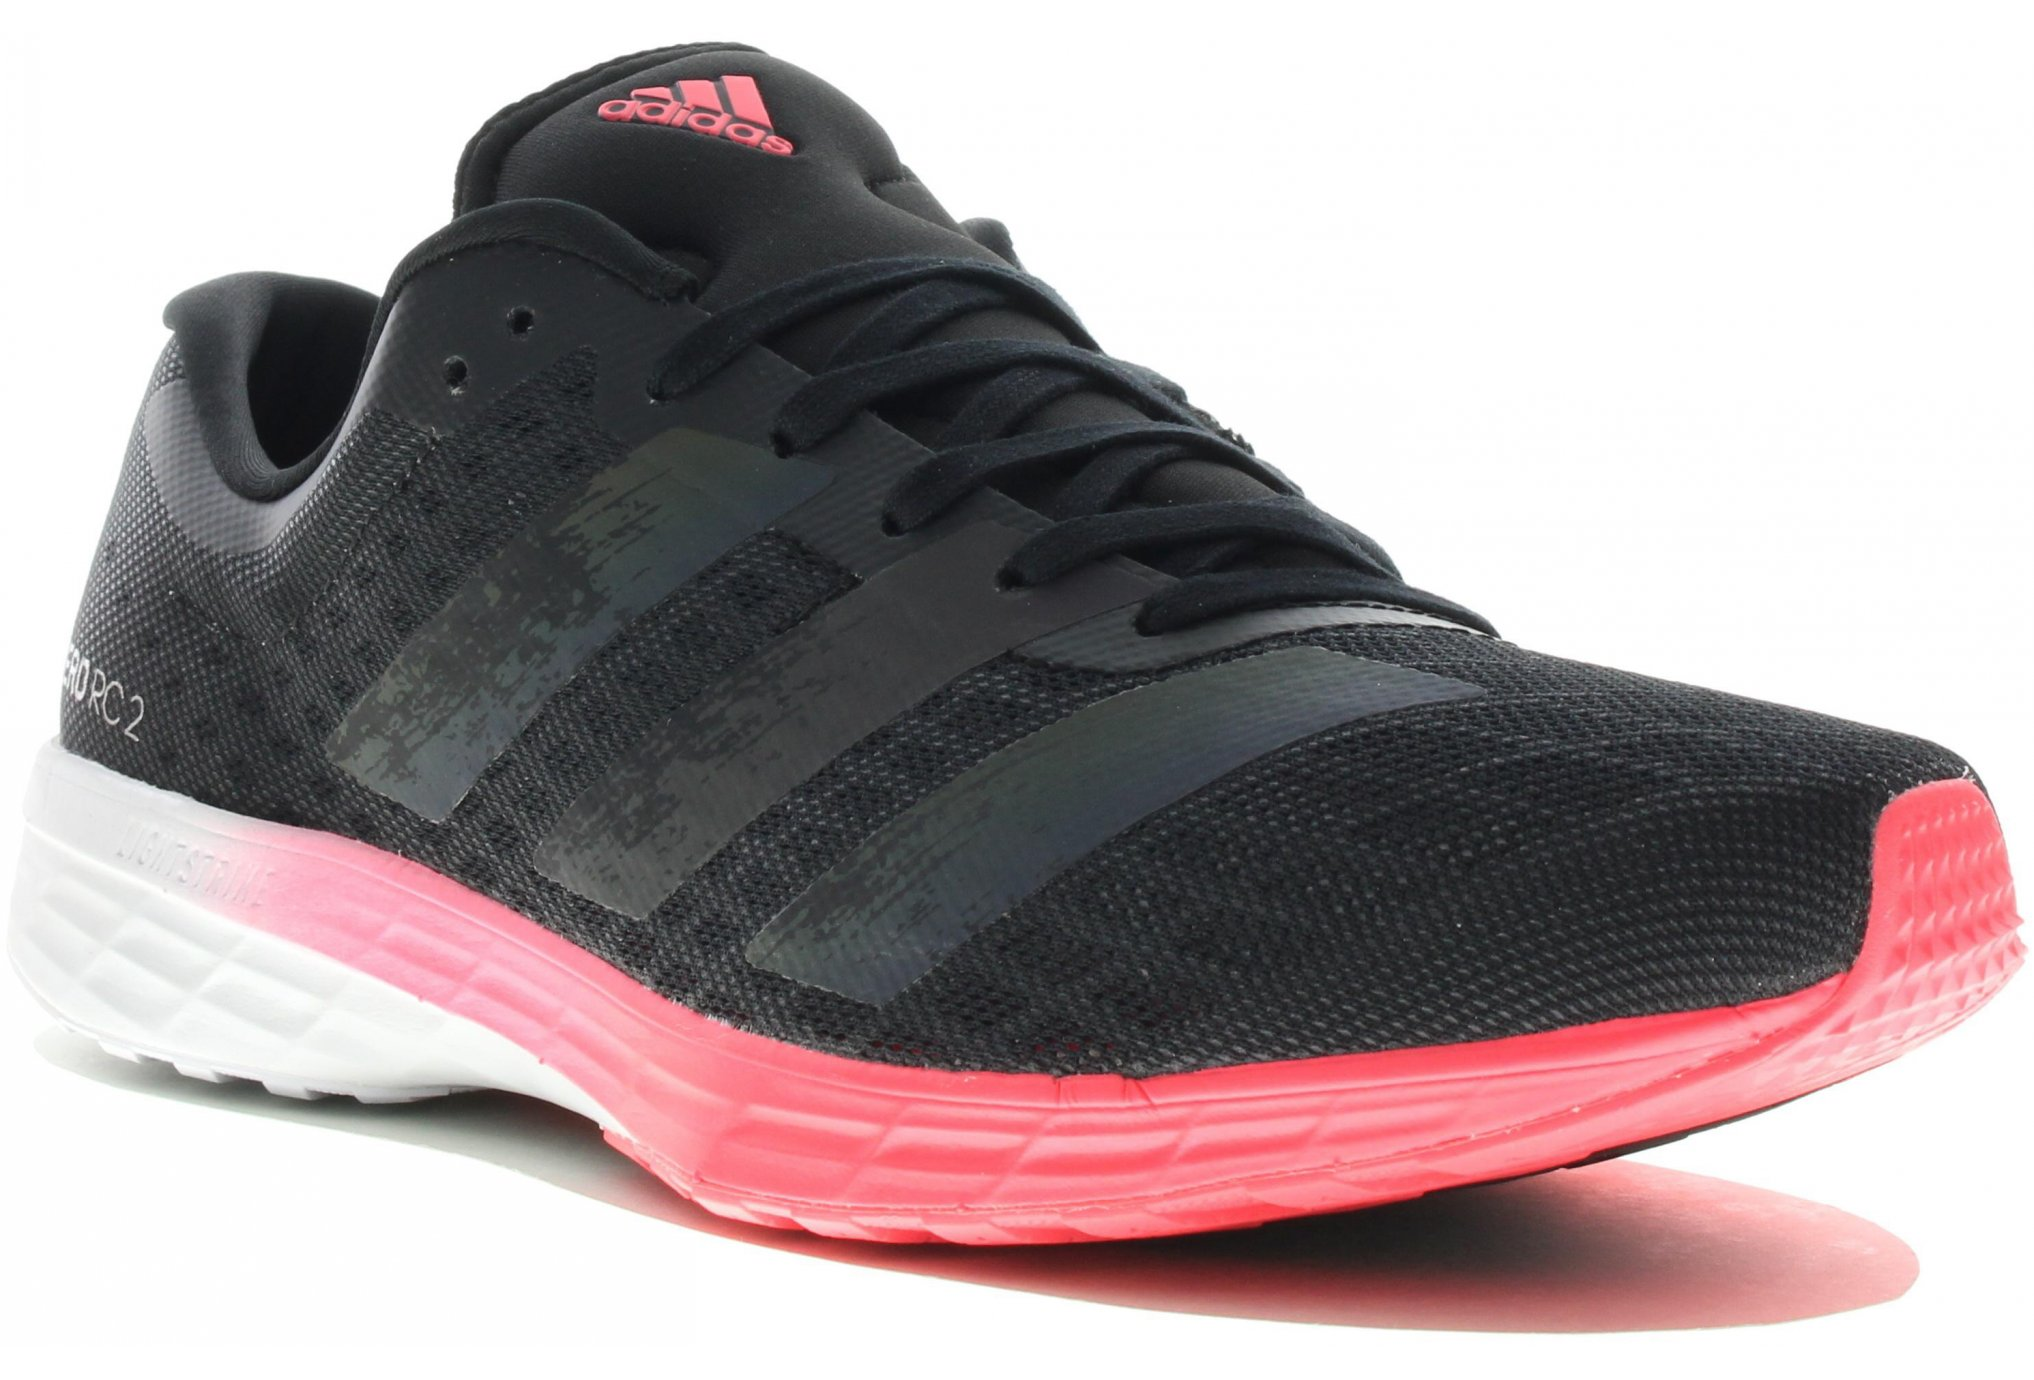 adidas adizero RC 2 Chaussures running femme